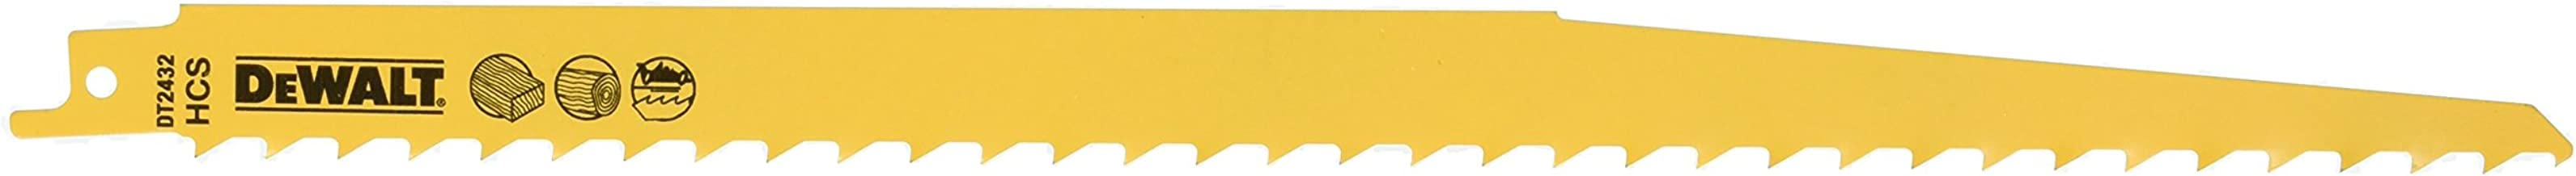 Dewalt Dt2432 Tilki Kuyruğu Testere, Sarı, 5 Adet